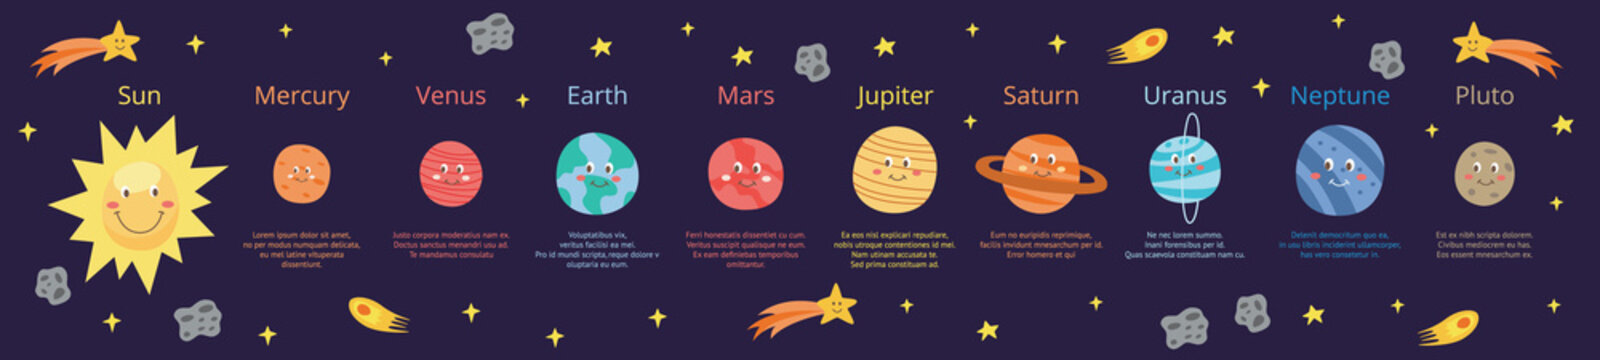 Cartoon planets of solar system educational banner flat vector illustration.